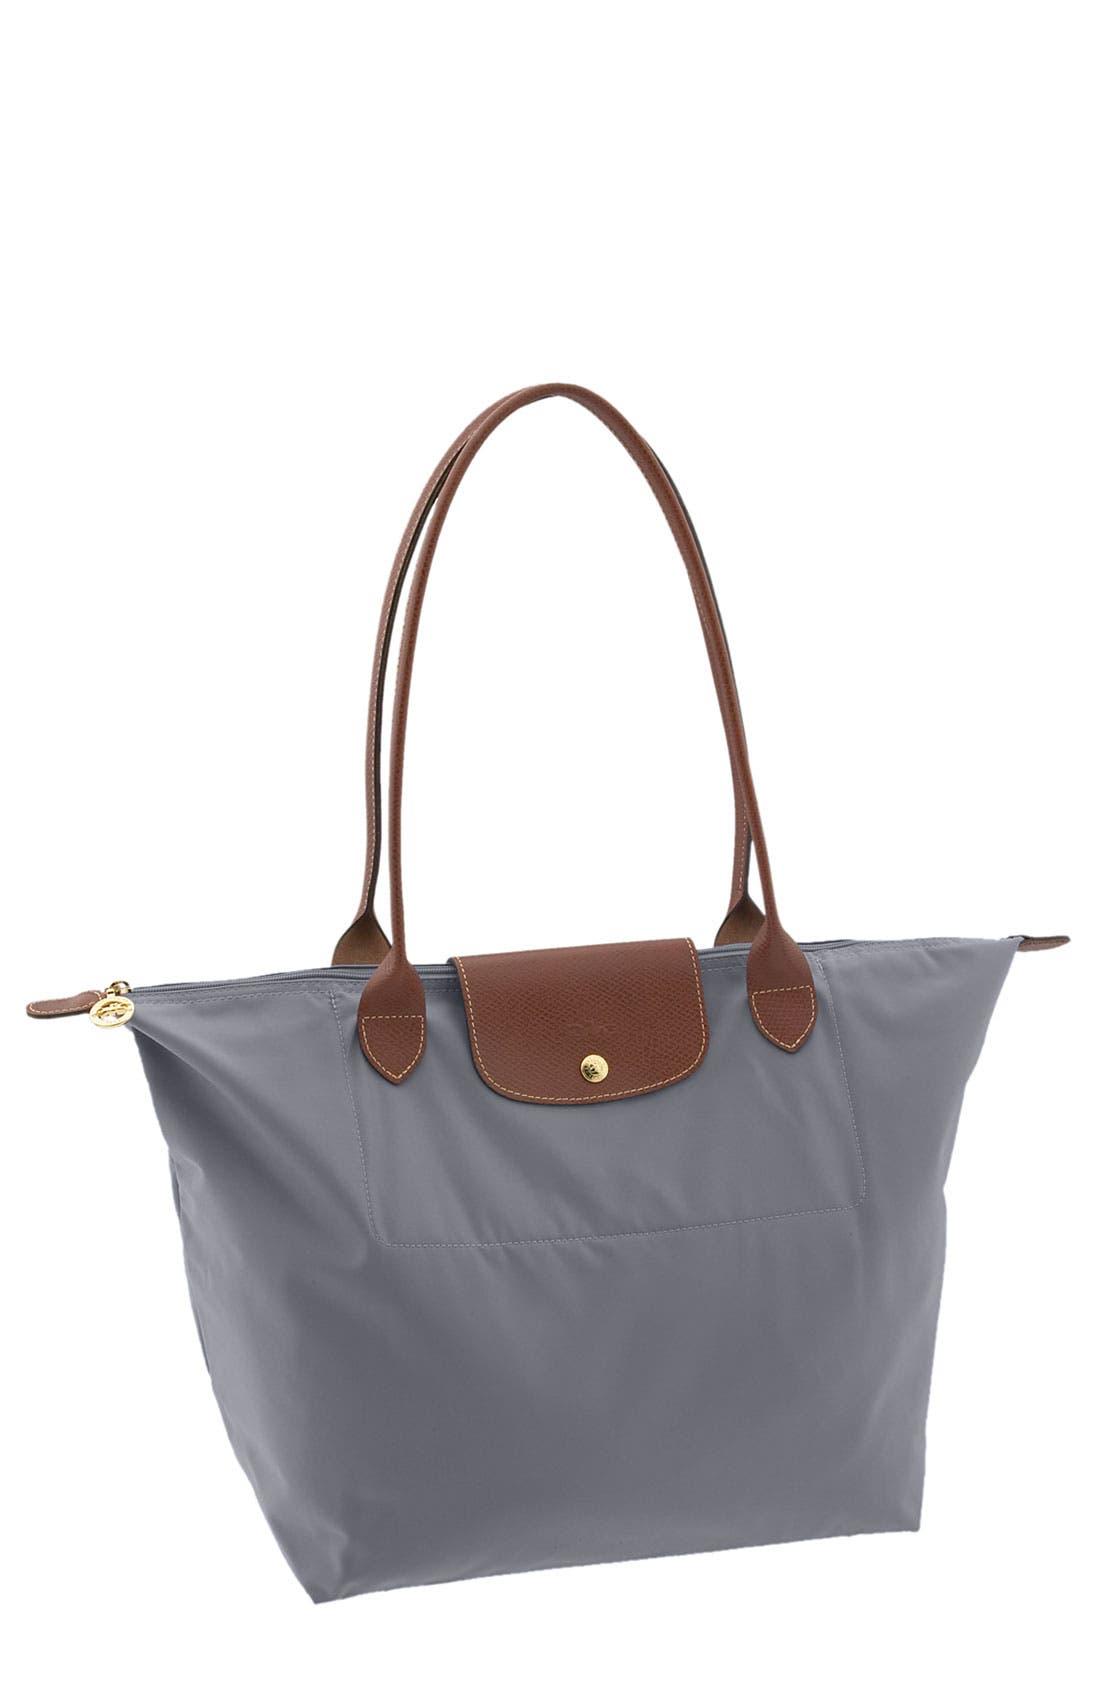 'Le Pliage - Large' Tote Bag, Main, color, 020